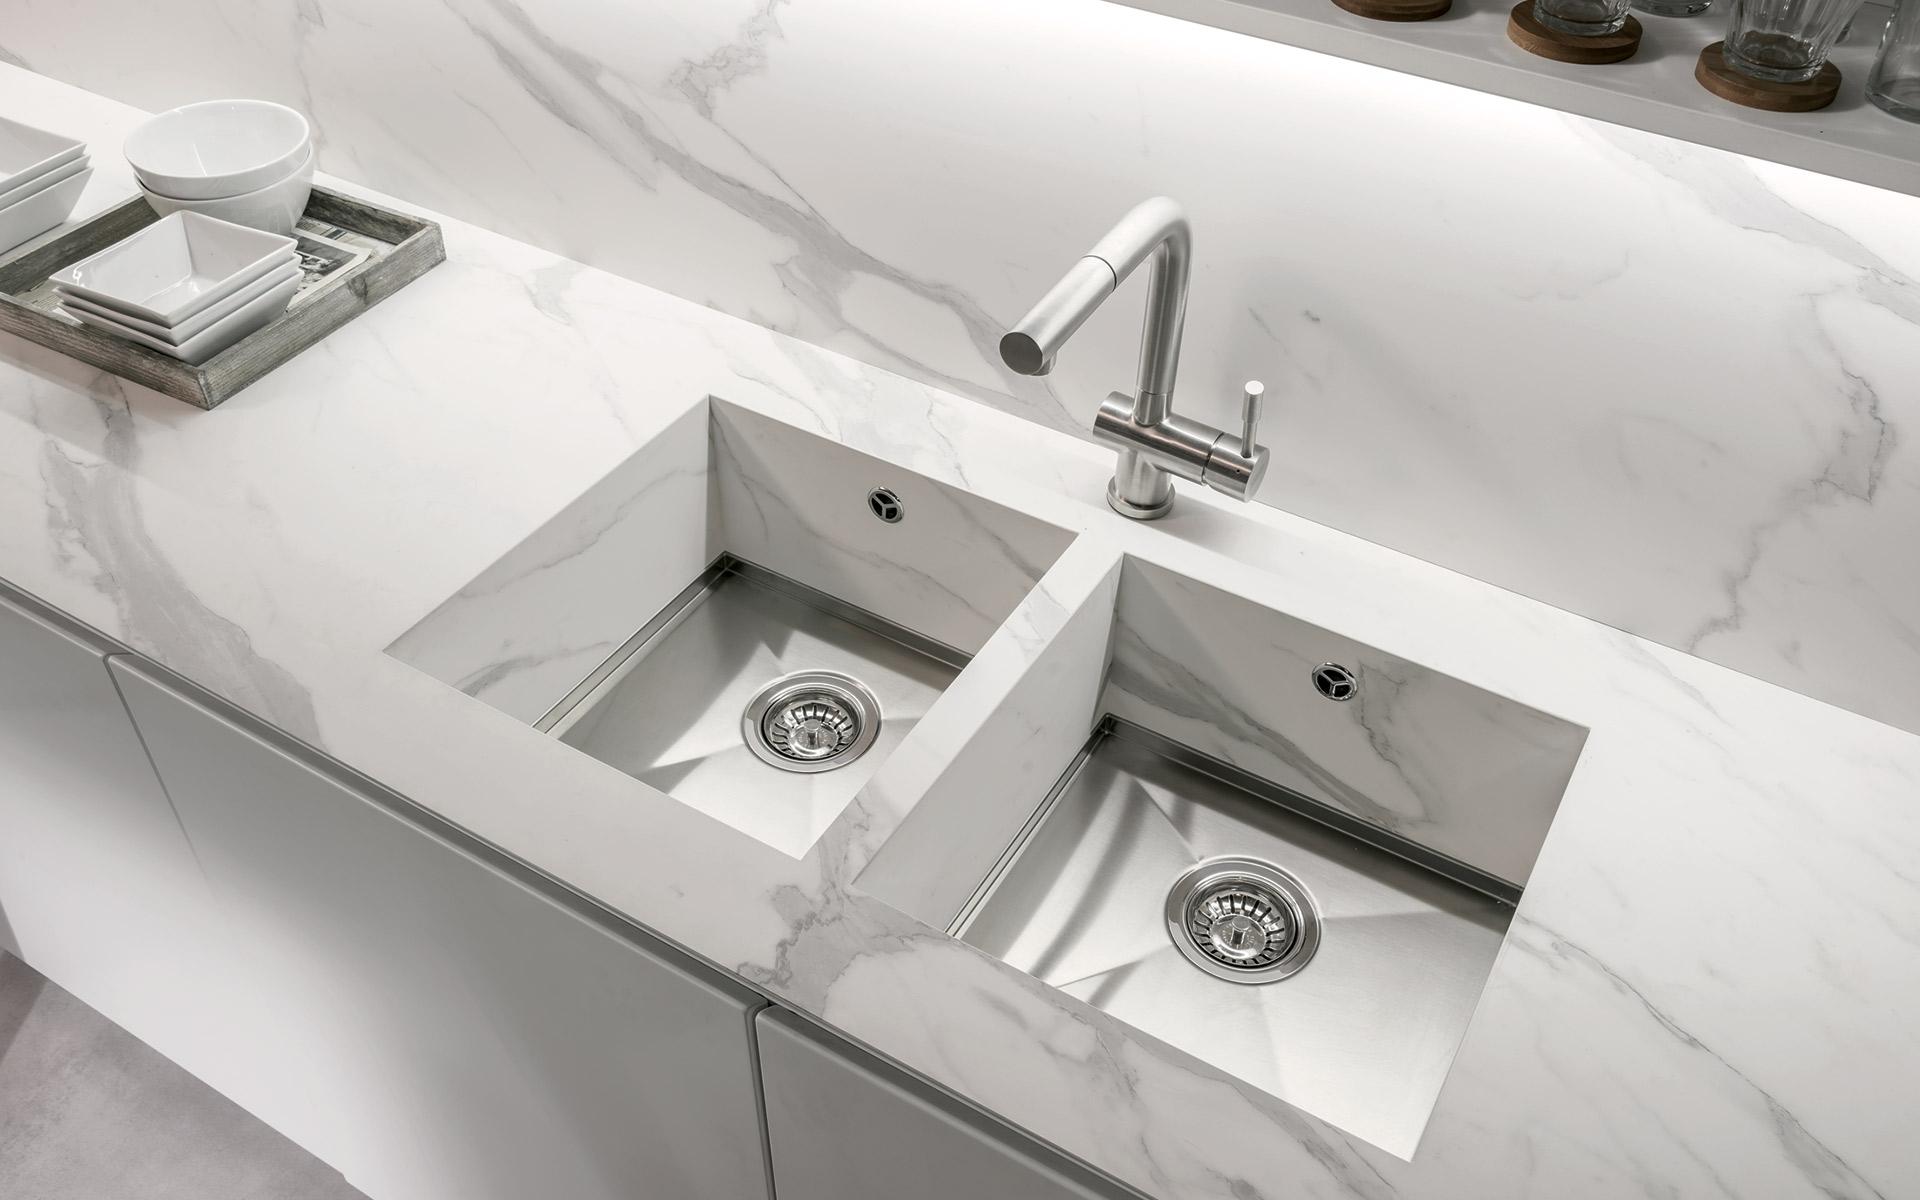 Laminato Hpl Piano Cucina Hpl - The Homey Design